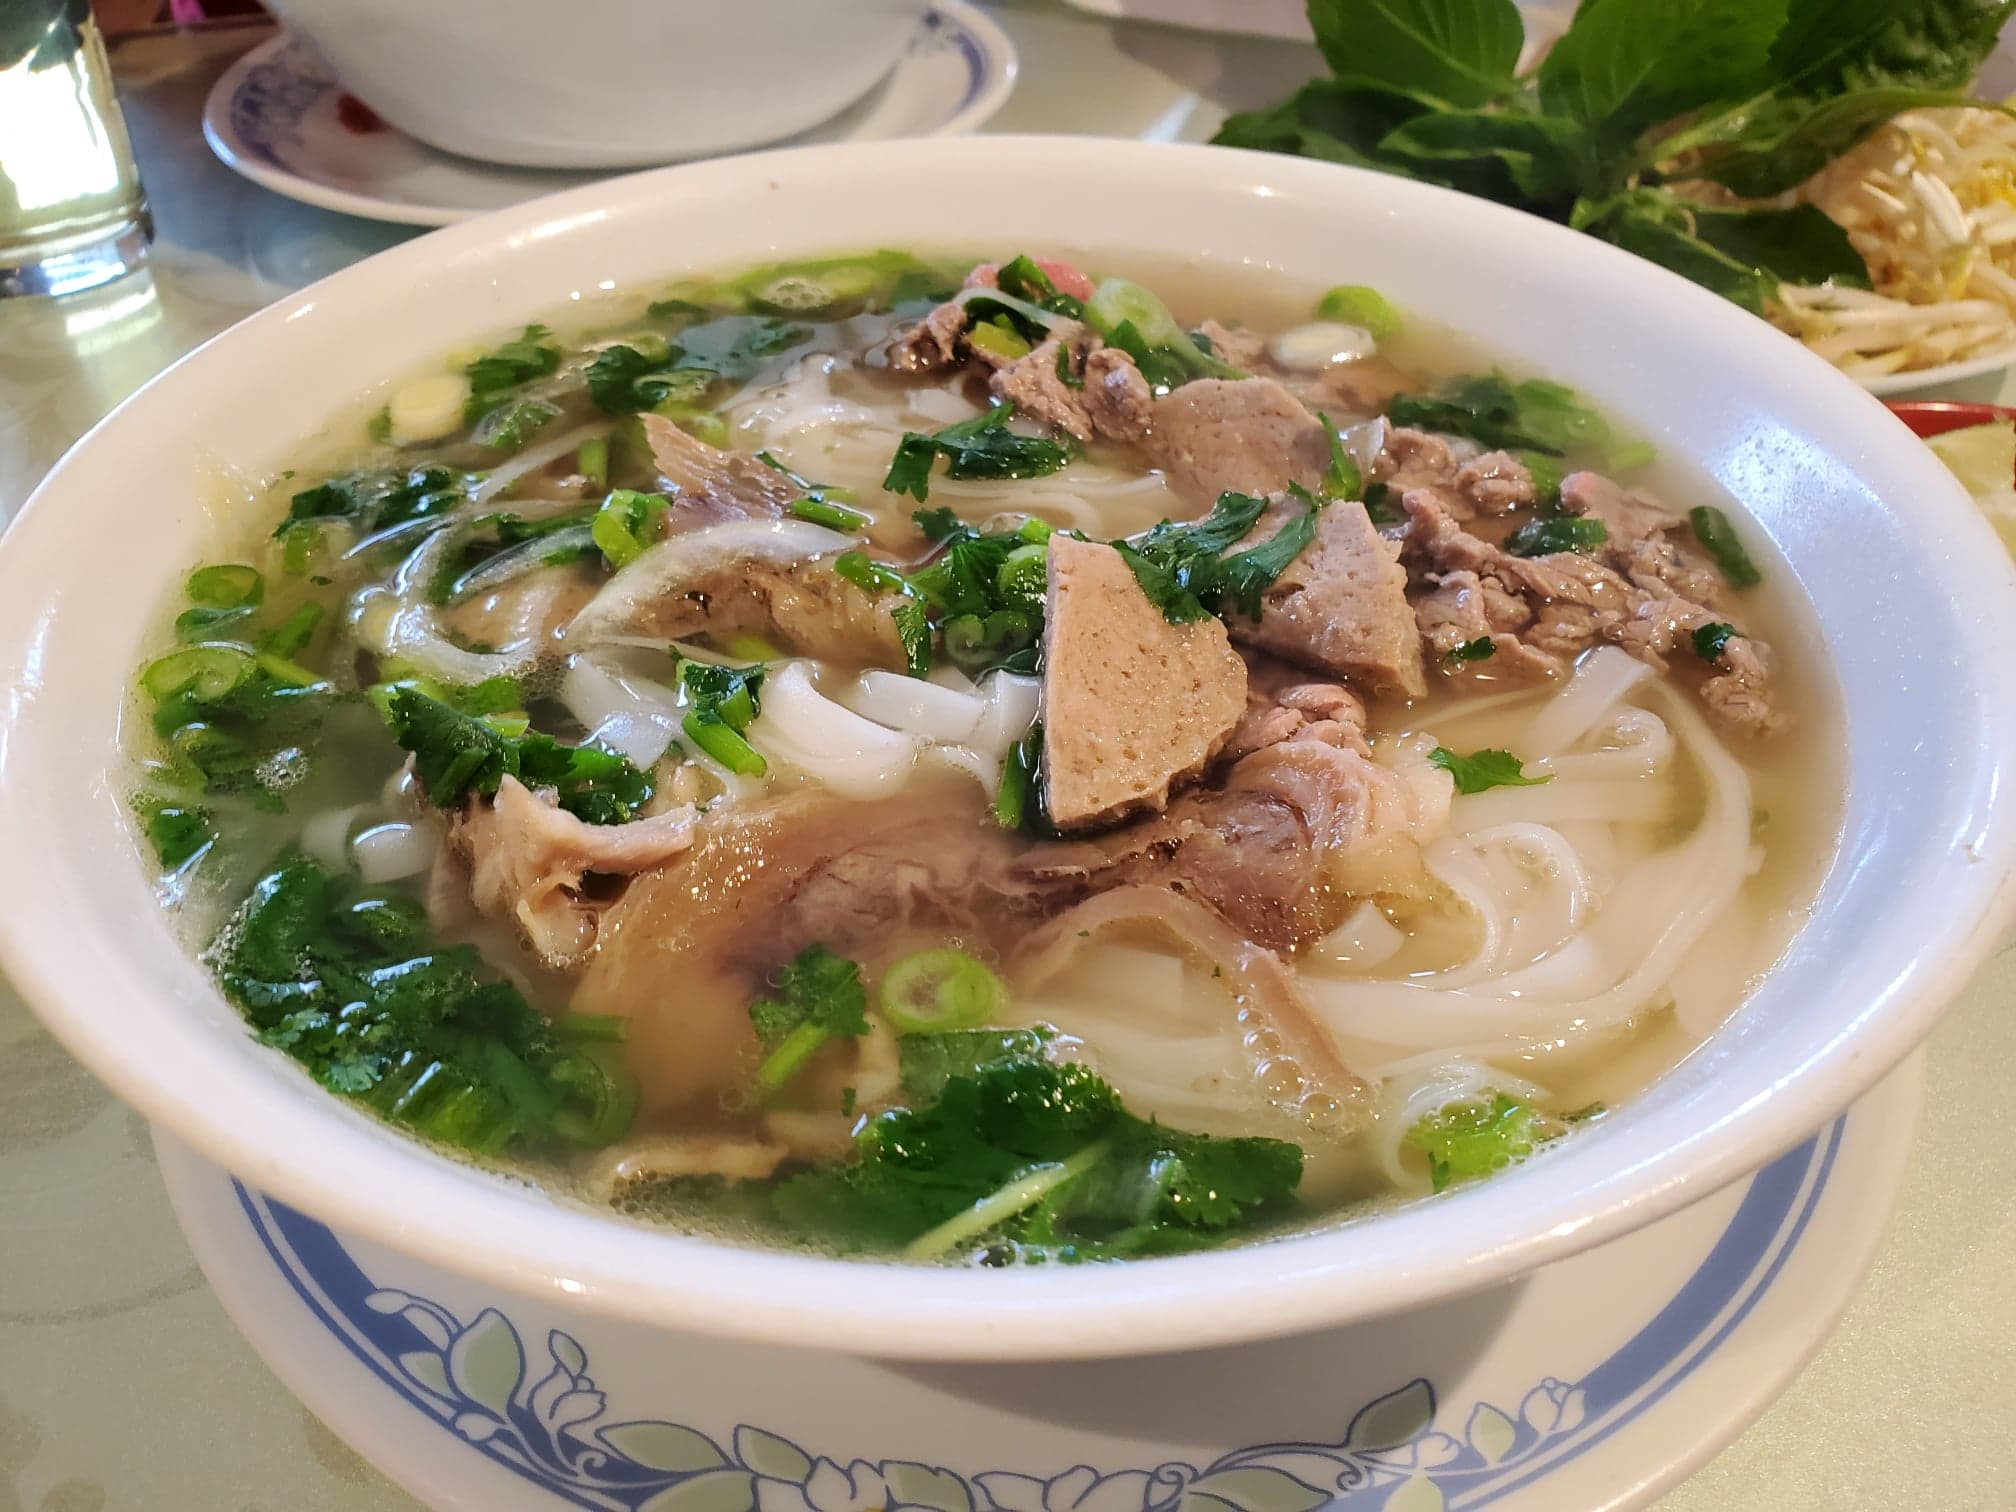 Cafe Dang Anh Pho